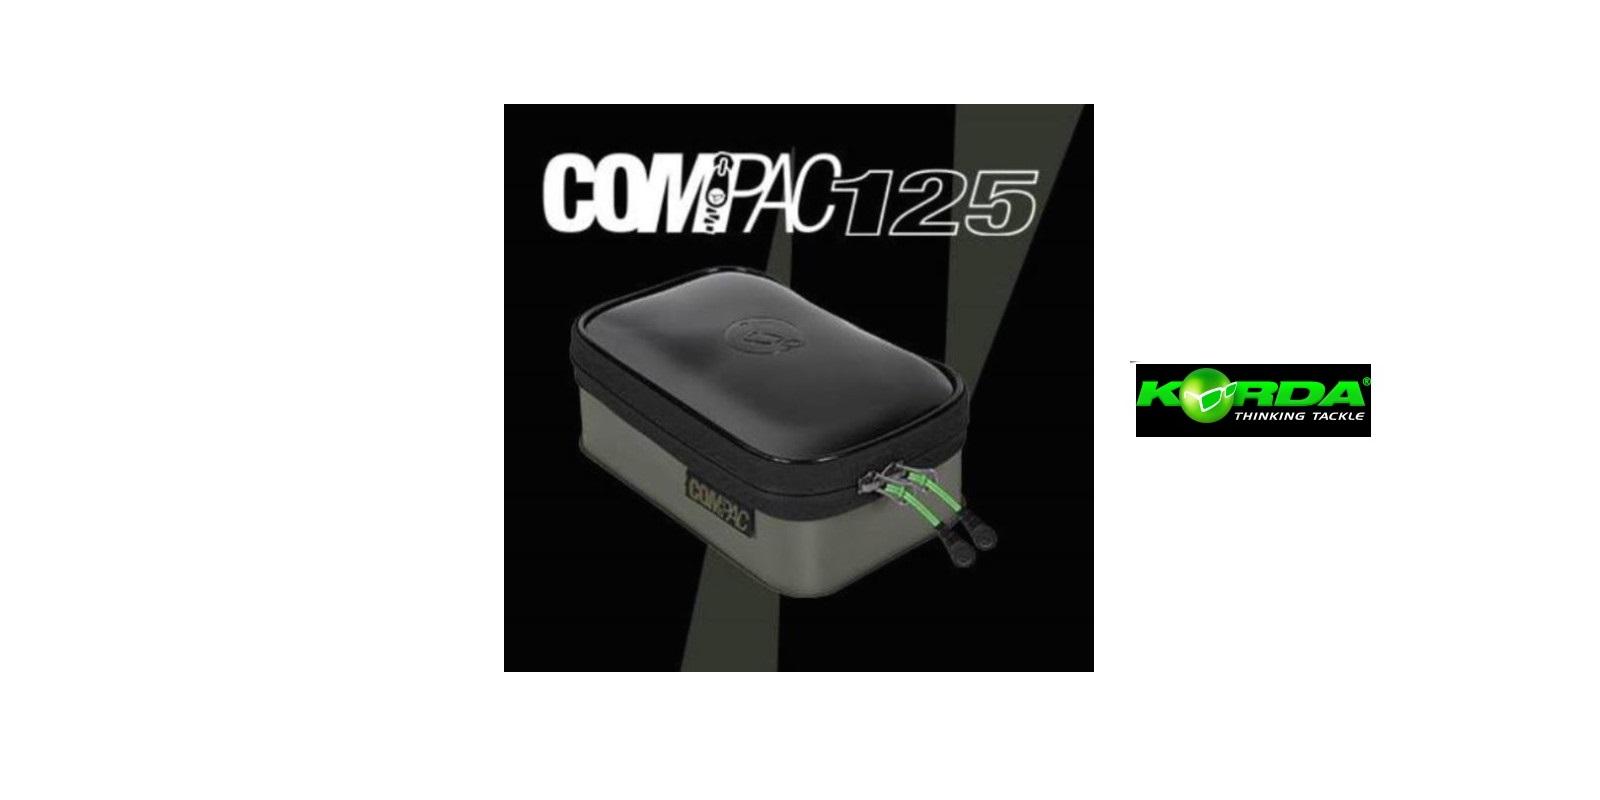 Borsa Compac Medium 125 Korda cod KLUG02